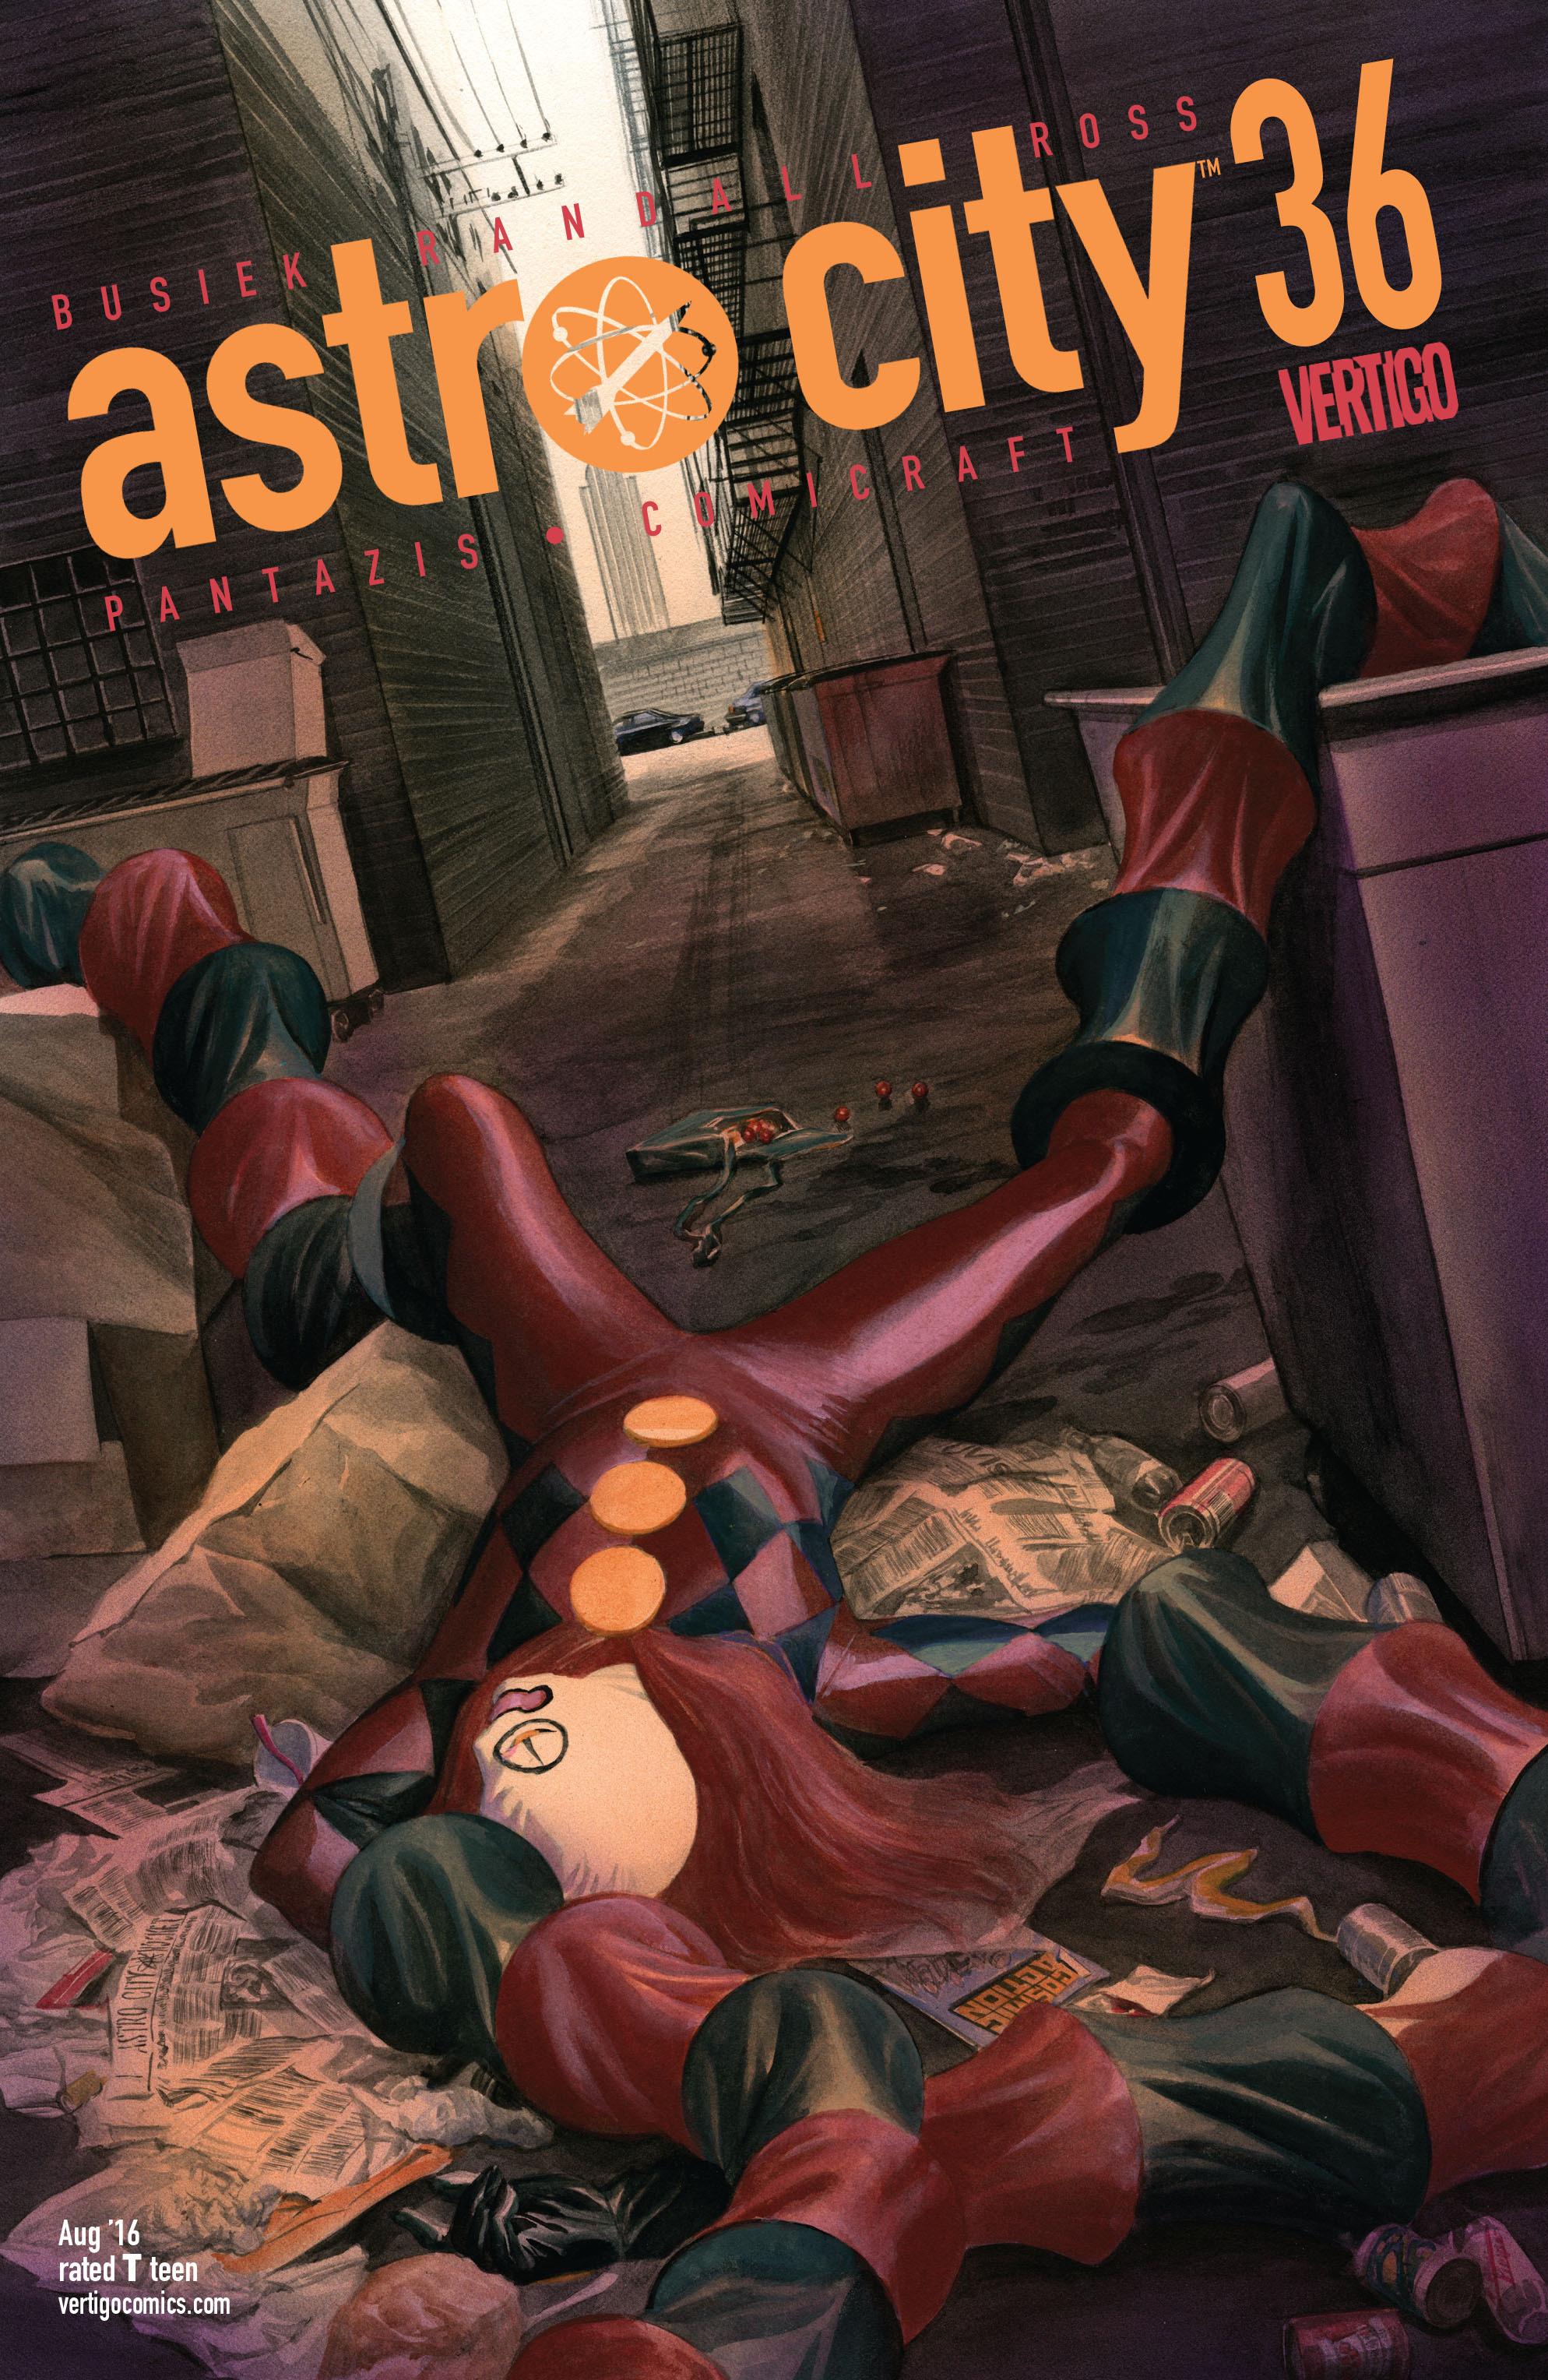 Read online Astro City comic -  Issue #36 - 1